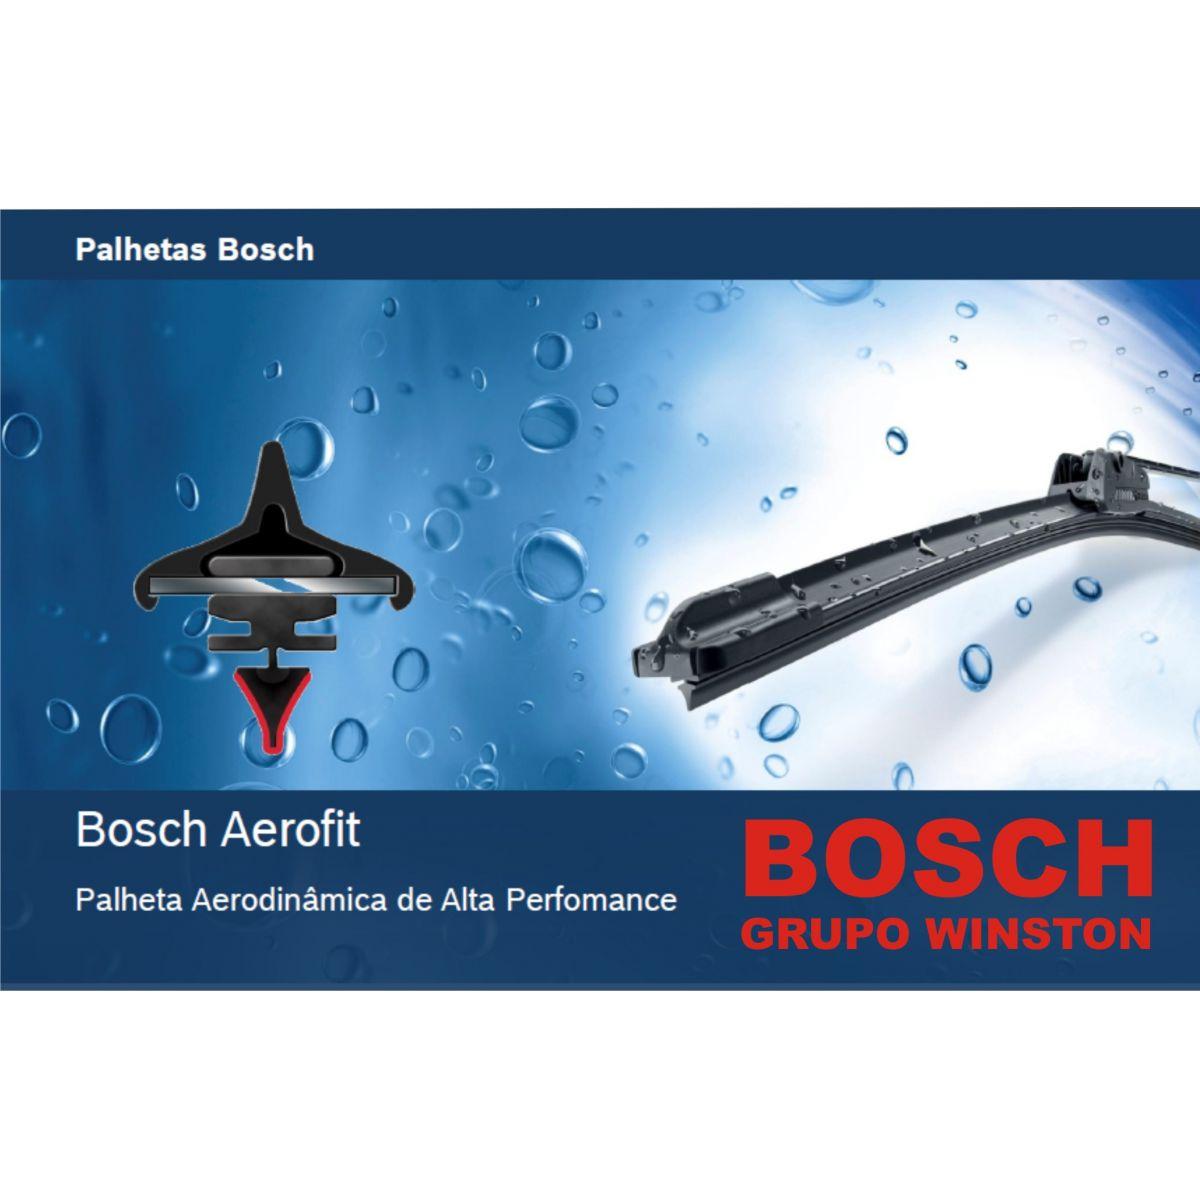 Palheta Bosch Aerofit Limpador de para brisa Bosch SUZUKI SX4